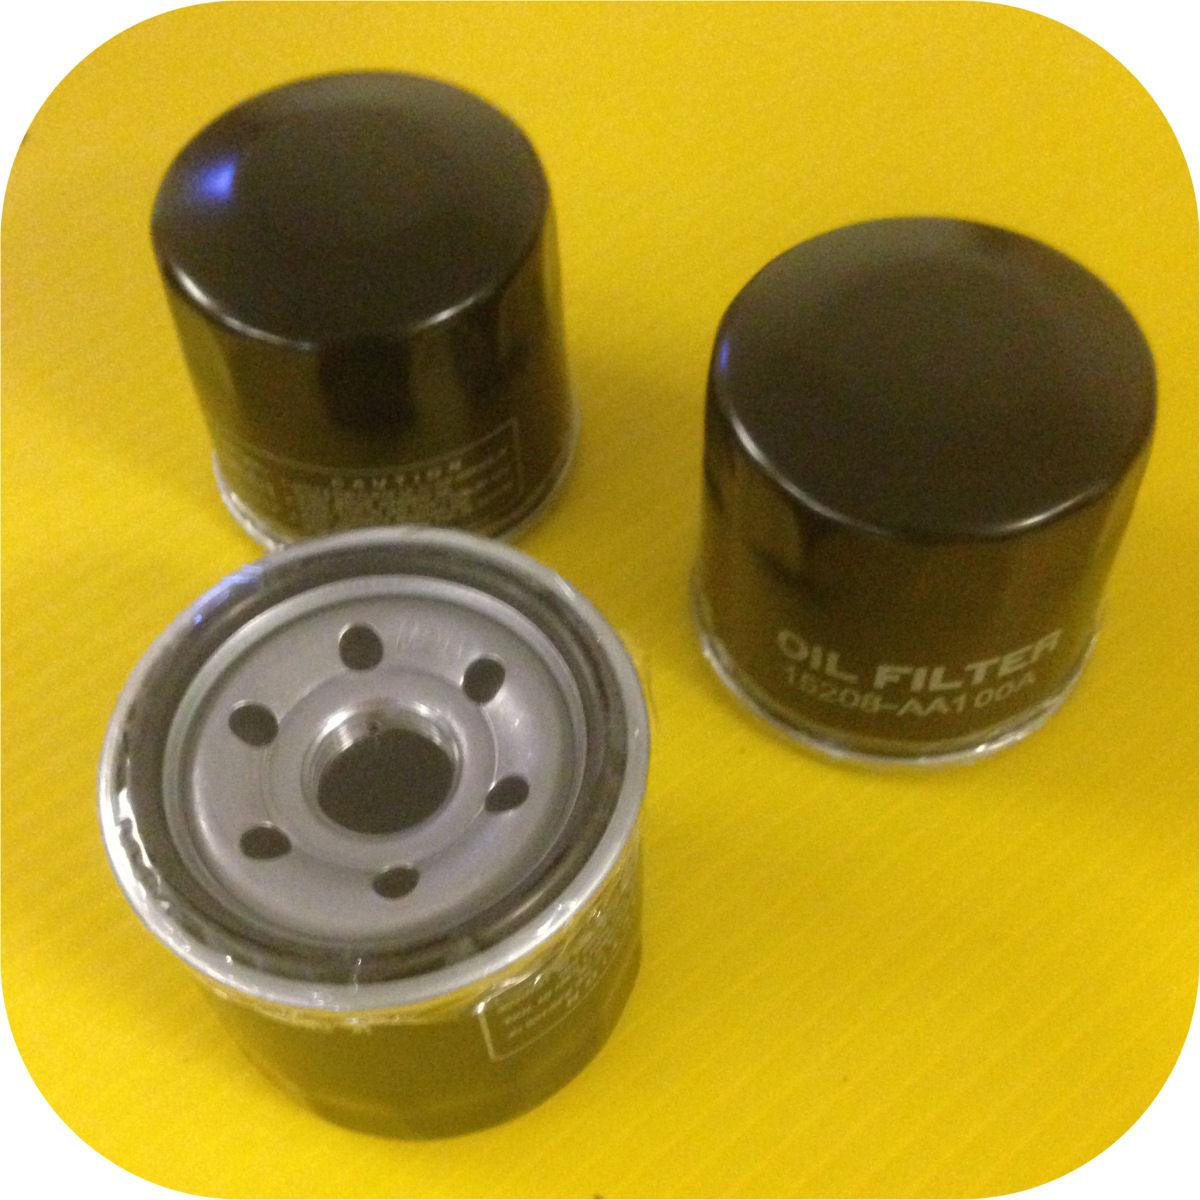 Oil Filter John Deere 330 430 445 655 670 755 X595 X495 ...